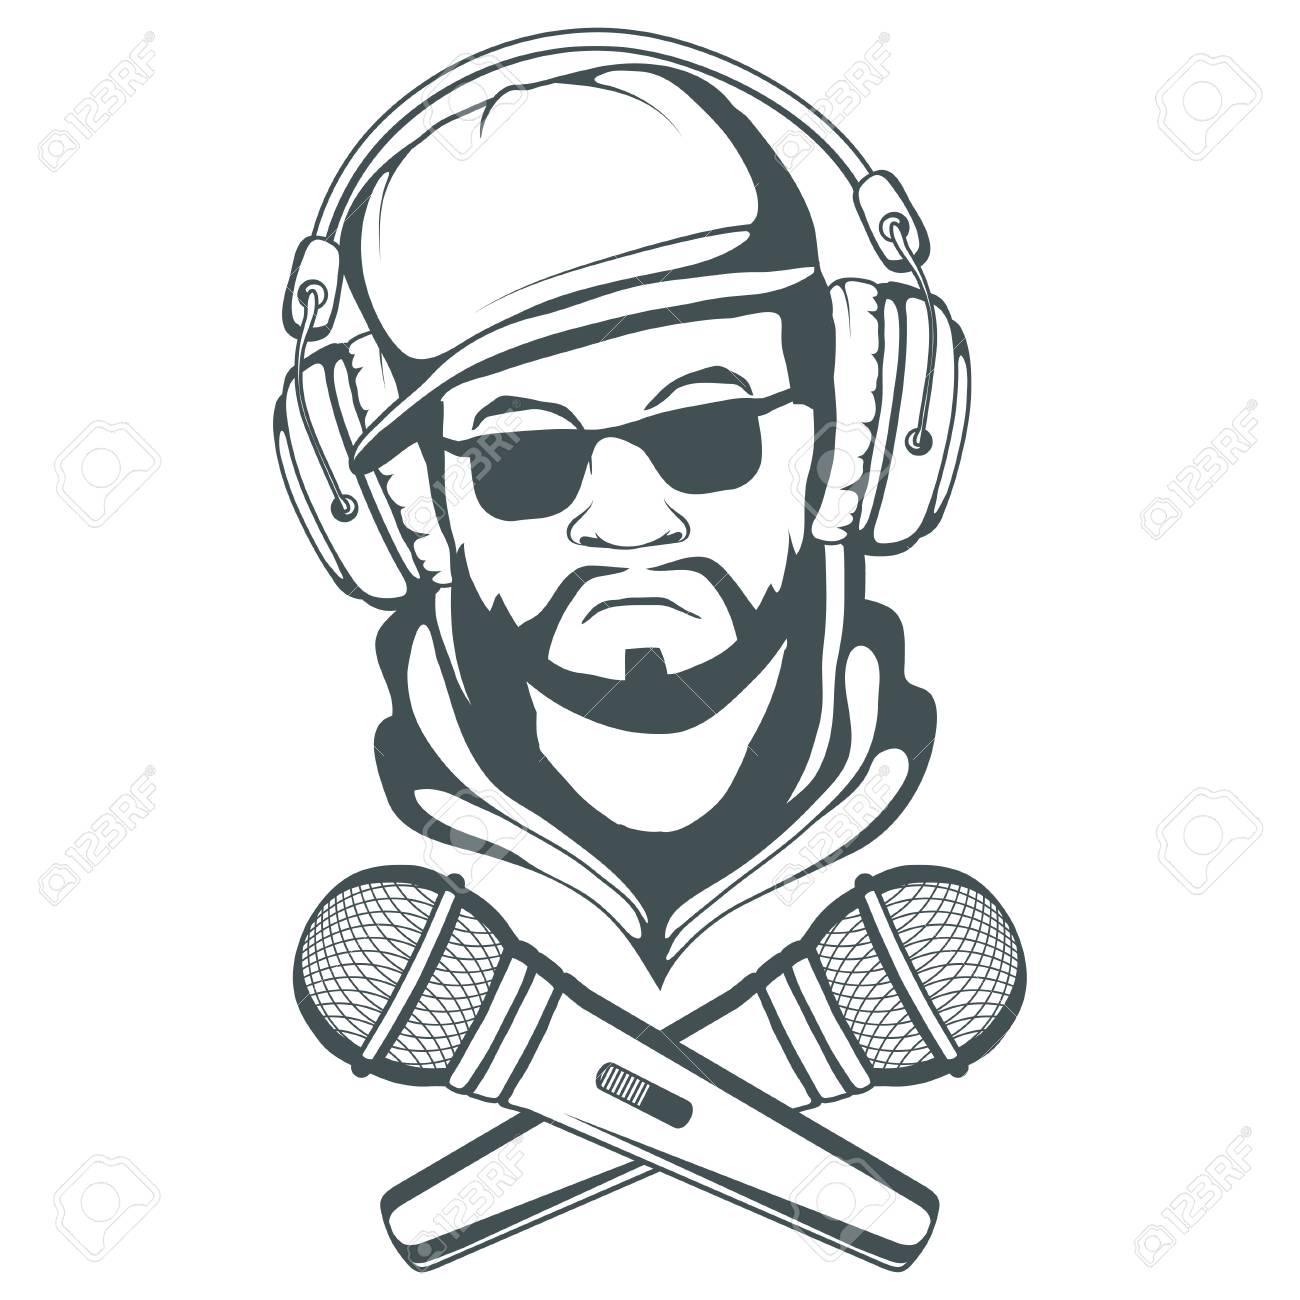 Rap music logo  Rapper skull on white background  Lettering with